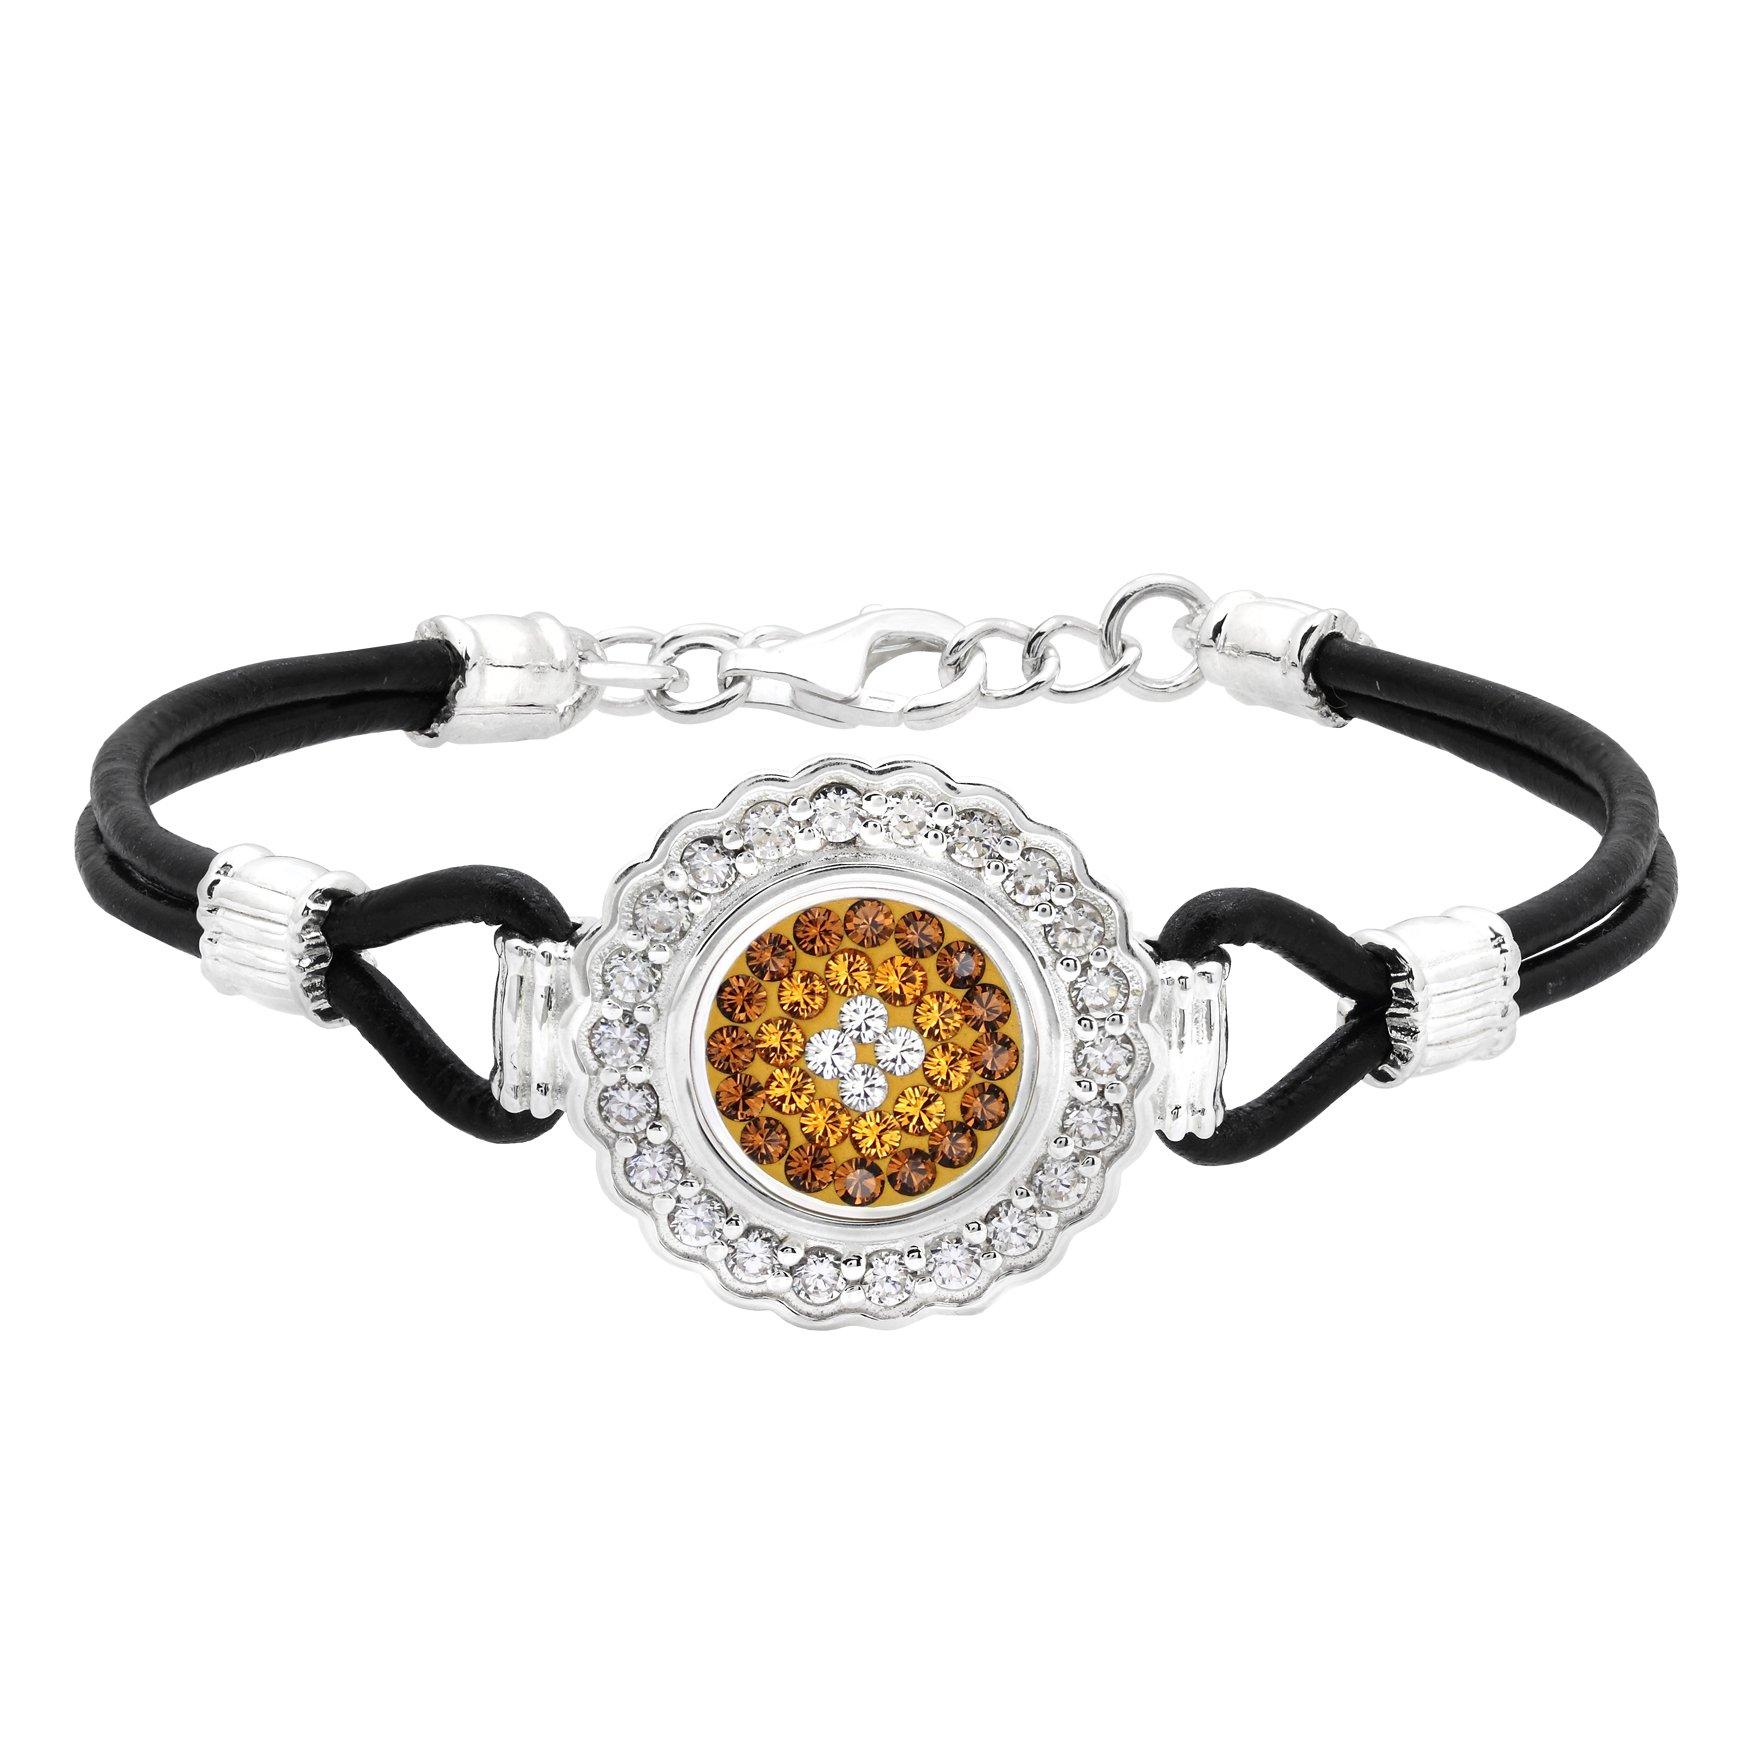 Kameleon Jewelry Sterling Silver Scalloped Leather Bracelet KBR004